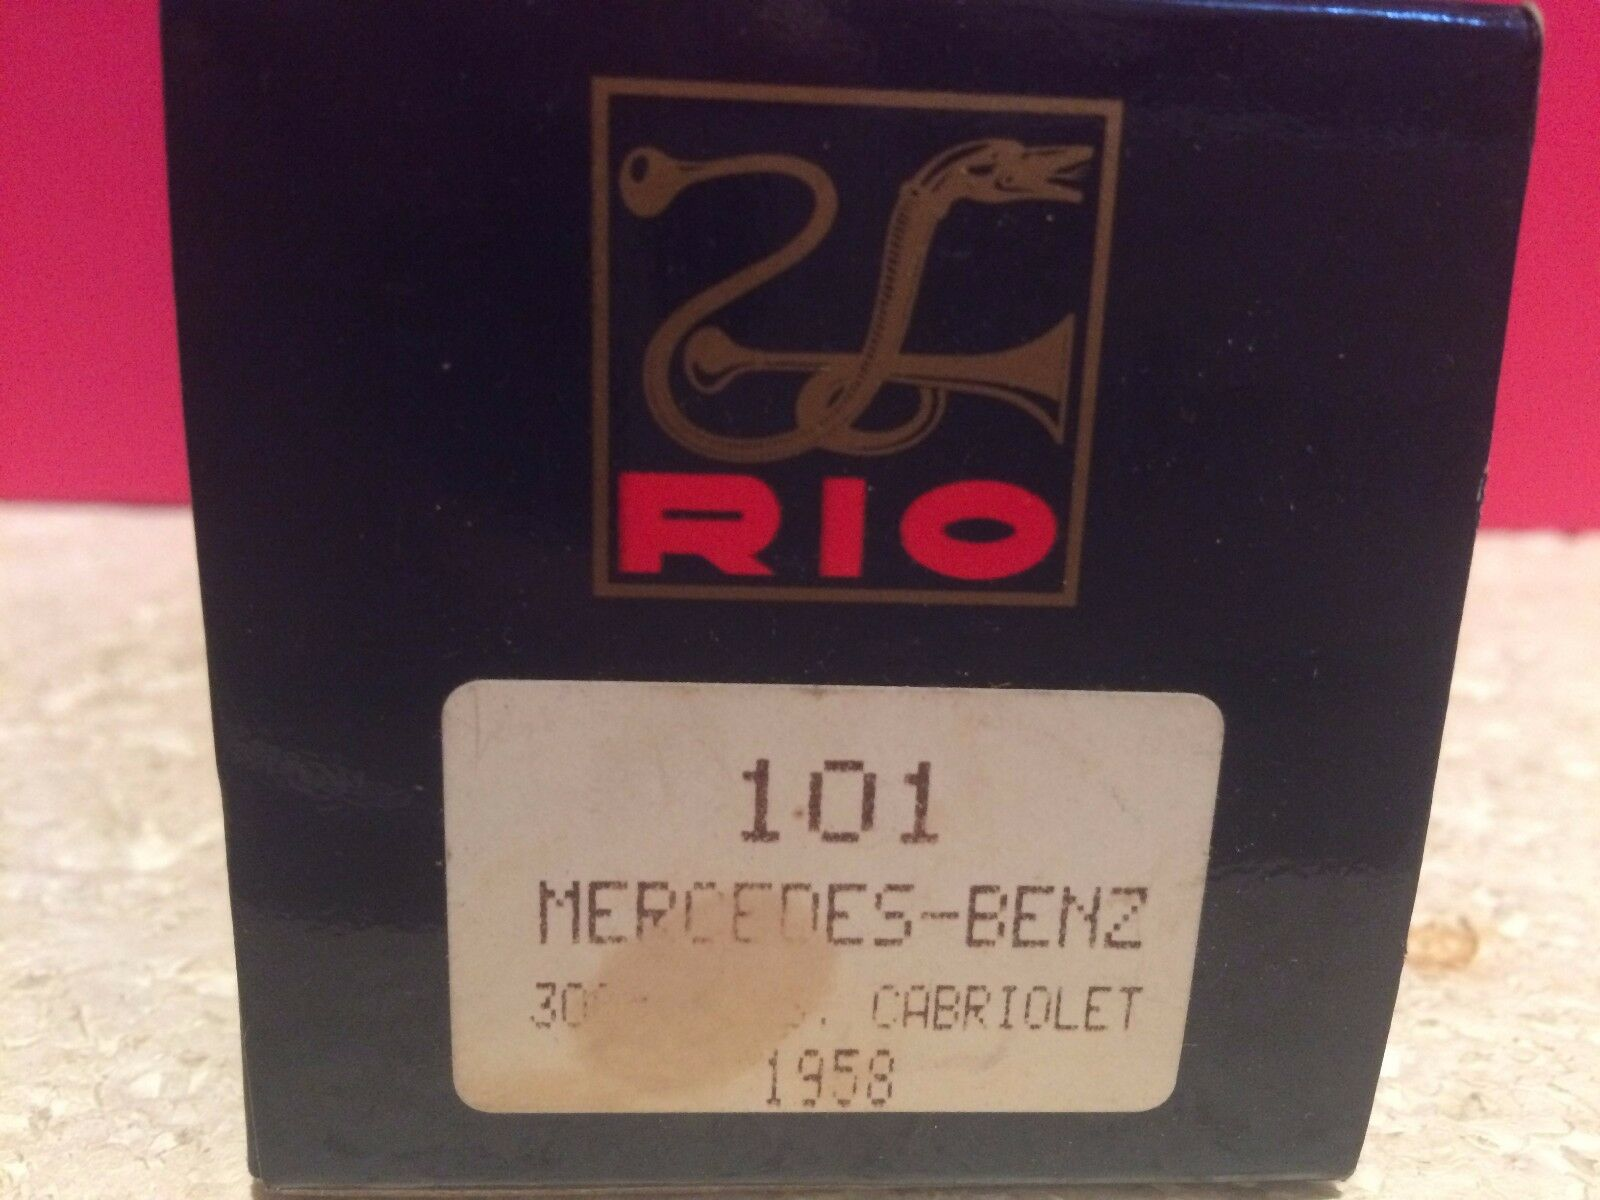 RIO SUPERBE SUPERBE SUPERBE MERCEDES BENZ 300 CABRIOLET 1958  NEUF EN BOITE 1 43 756d41